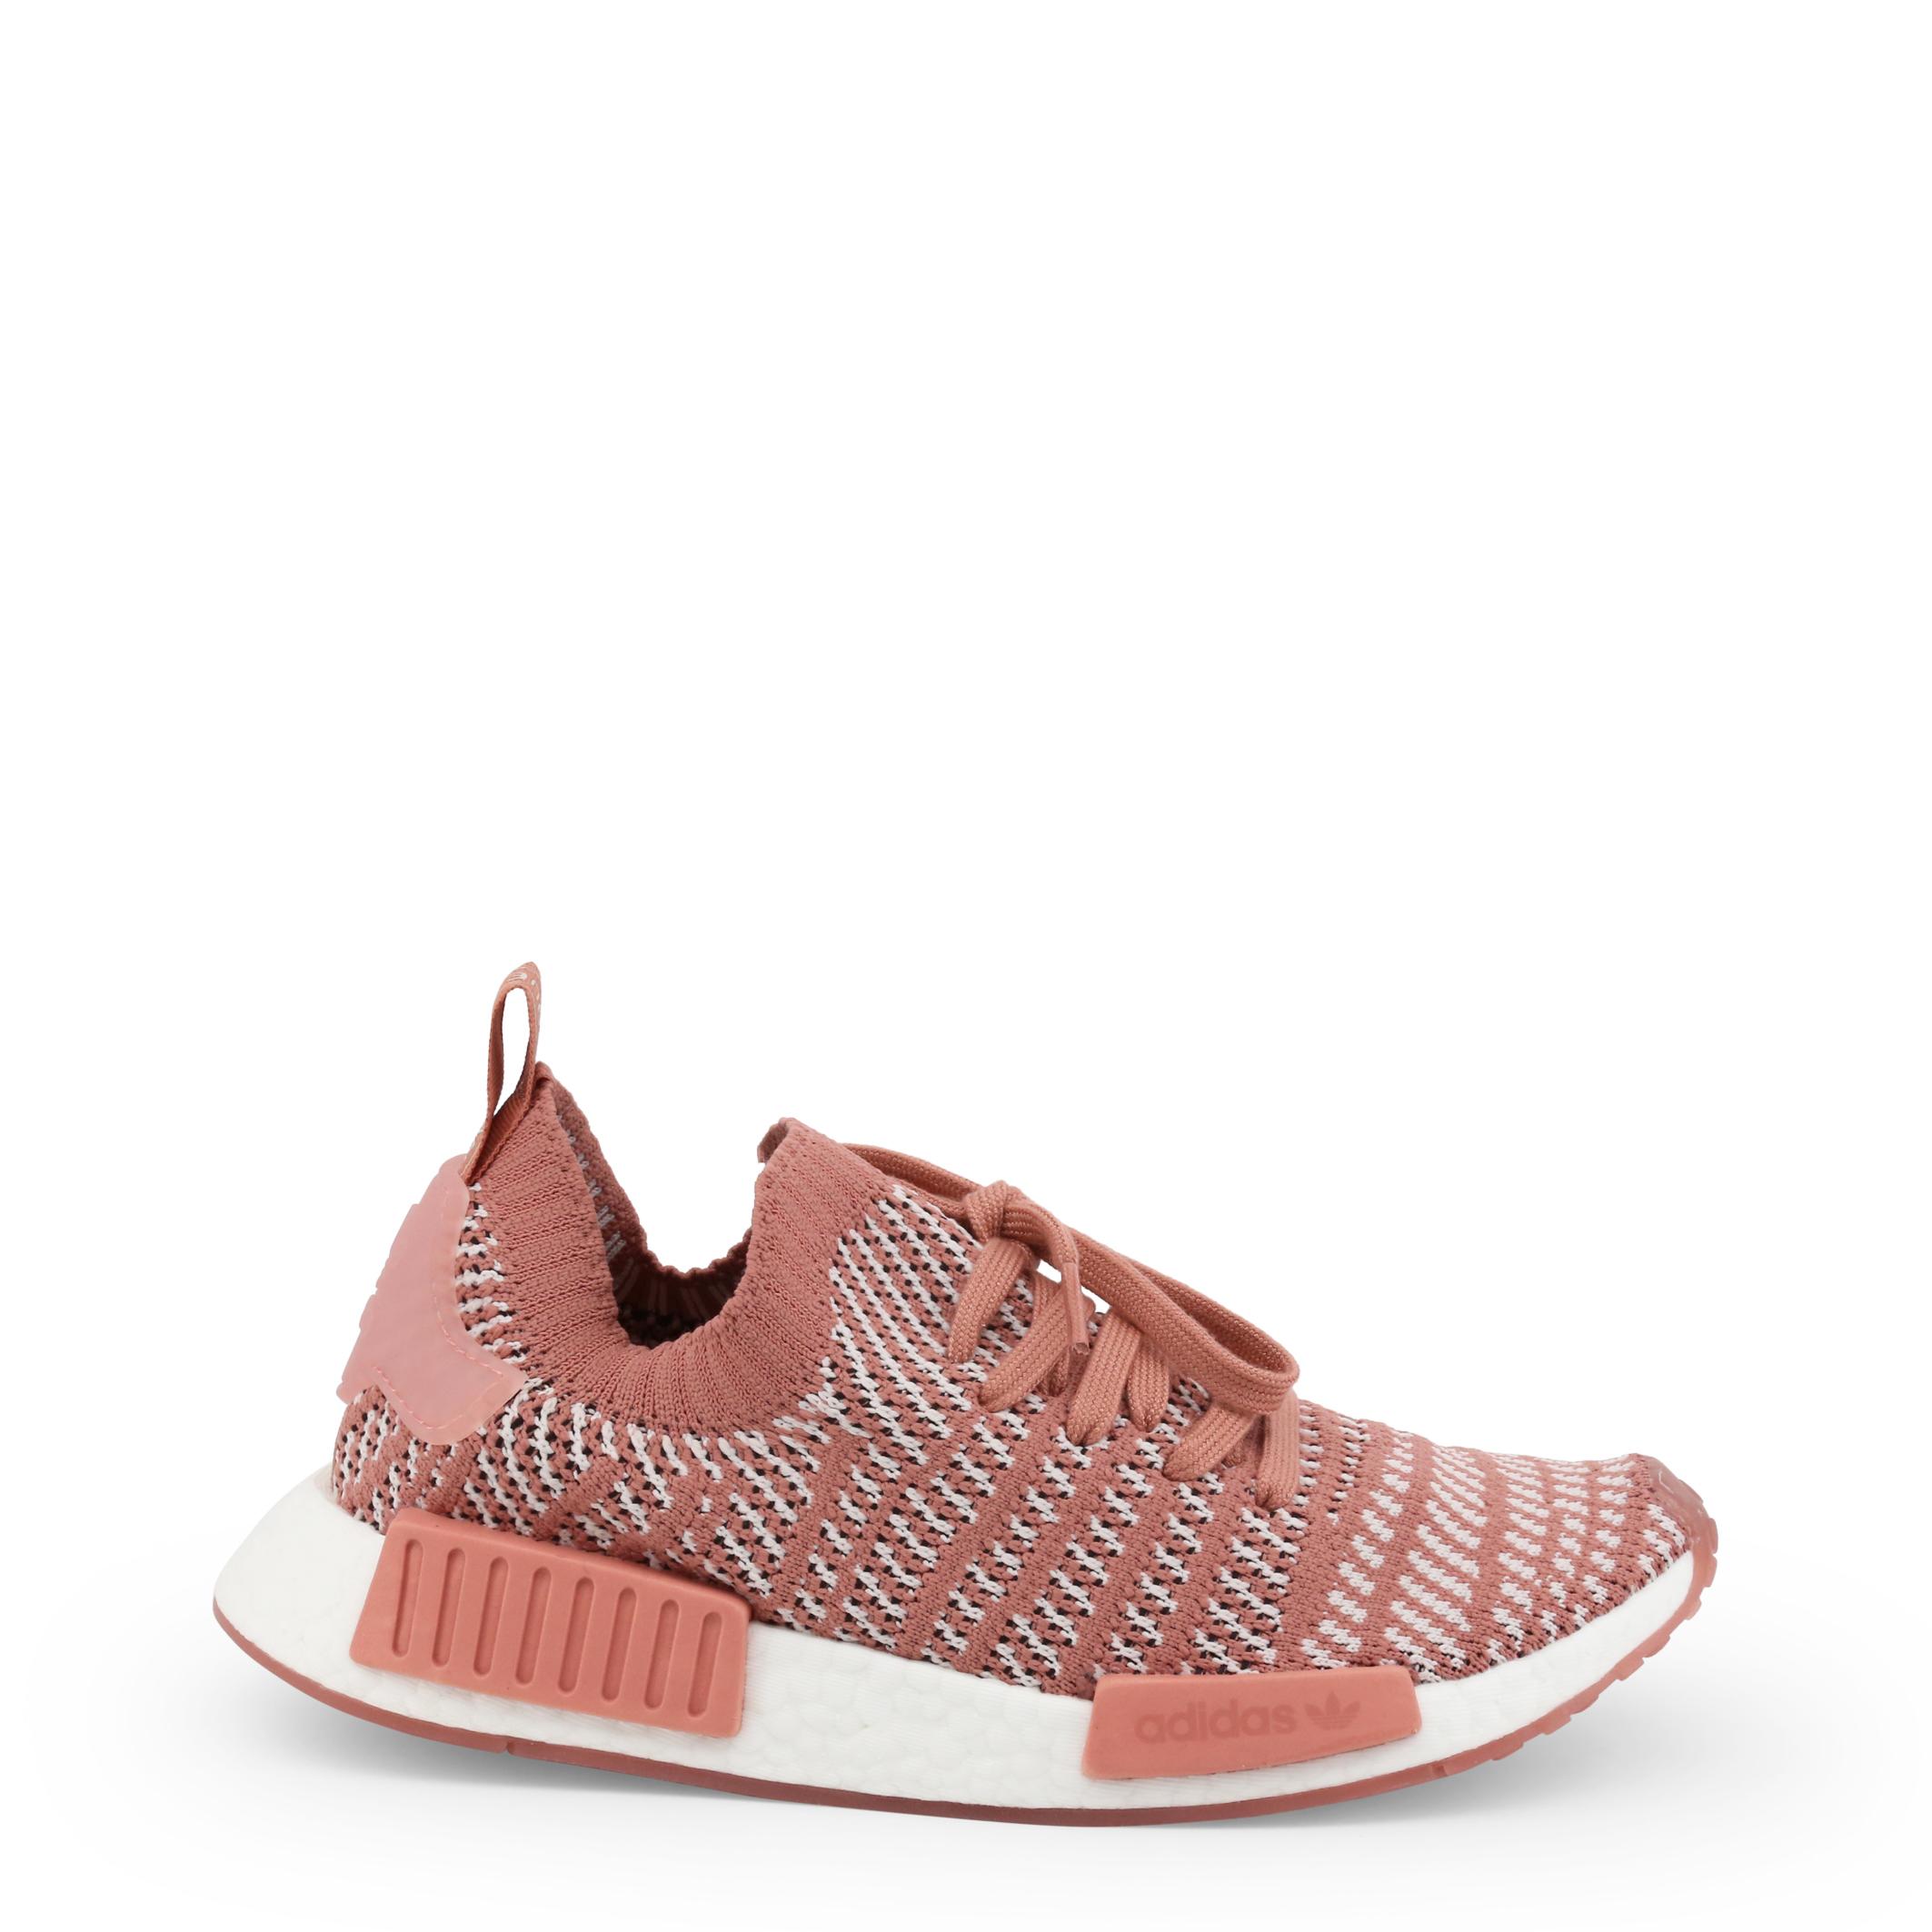 Sneakers Adidas CQ2028_NMD_R1_STLT